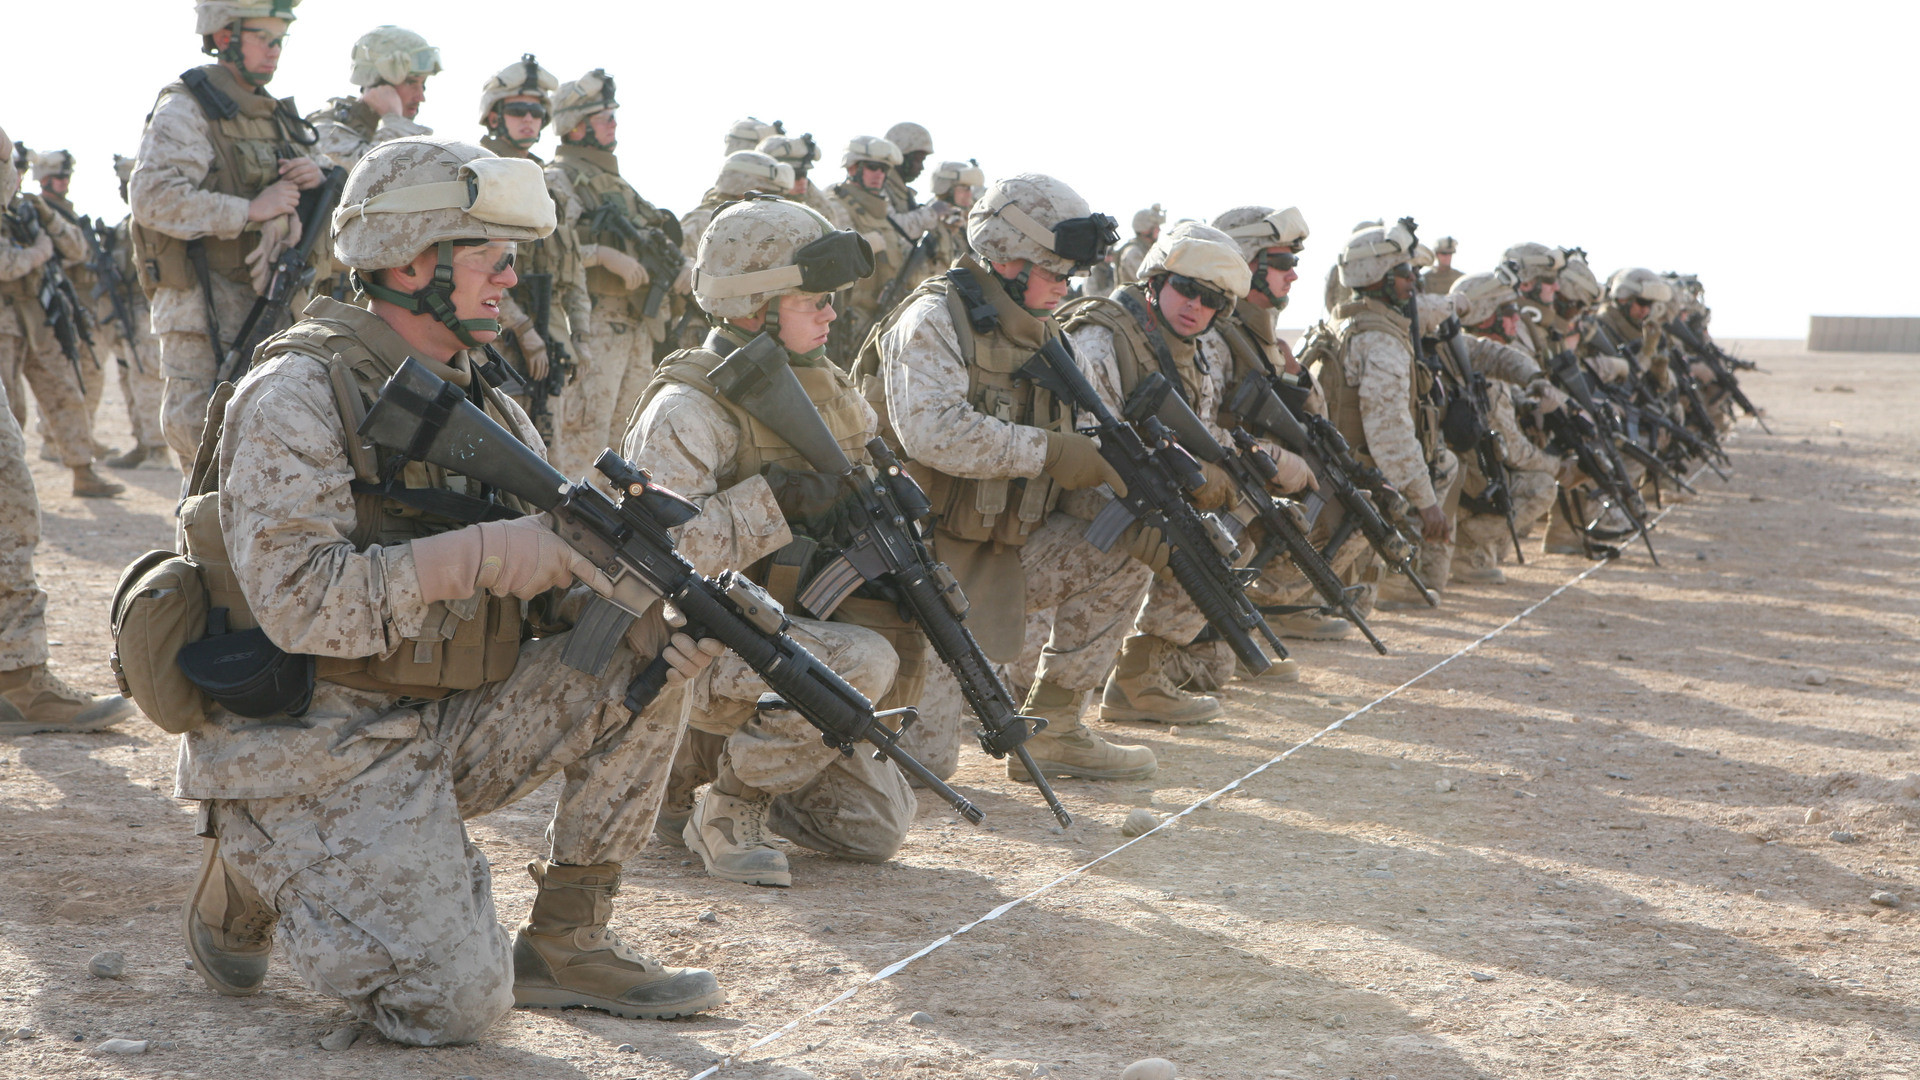 US Marine Corps #6913493